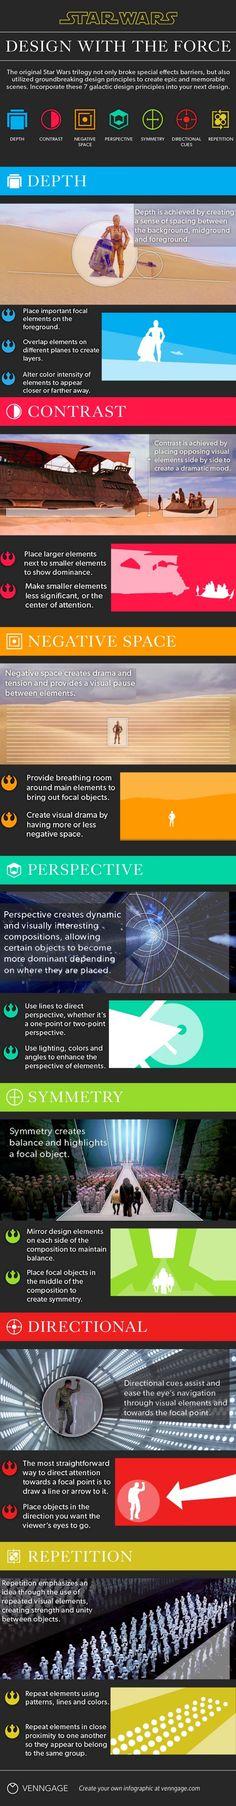 7 Essential Design Principles Star Wars Taught Us